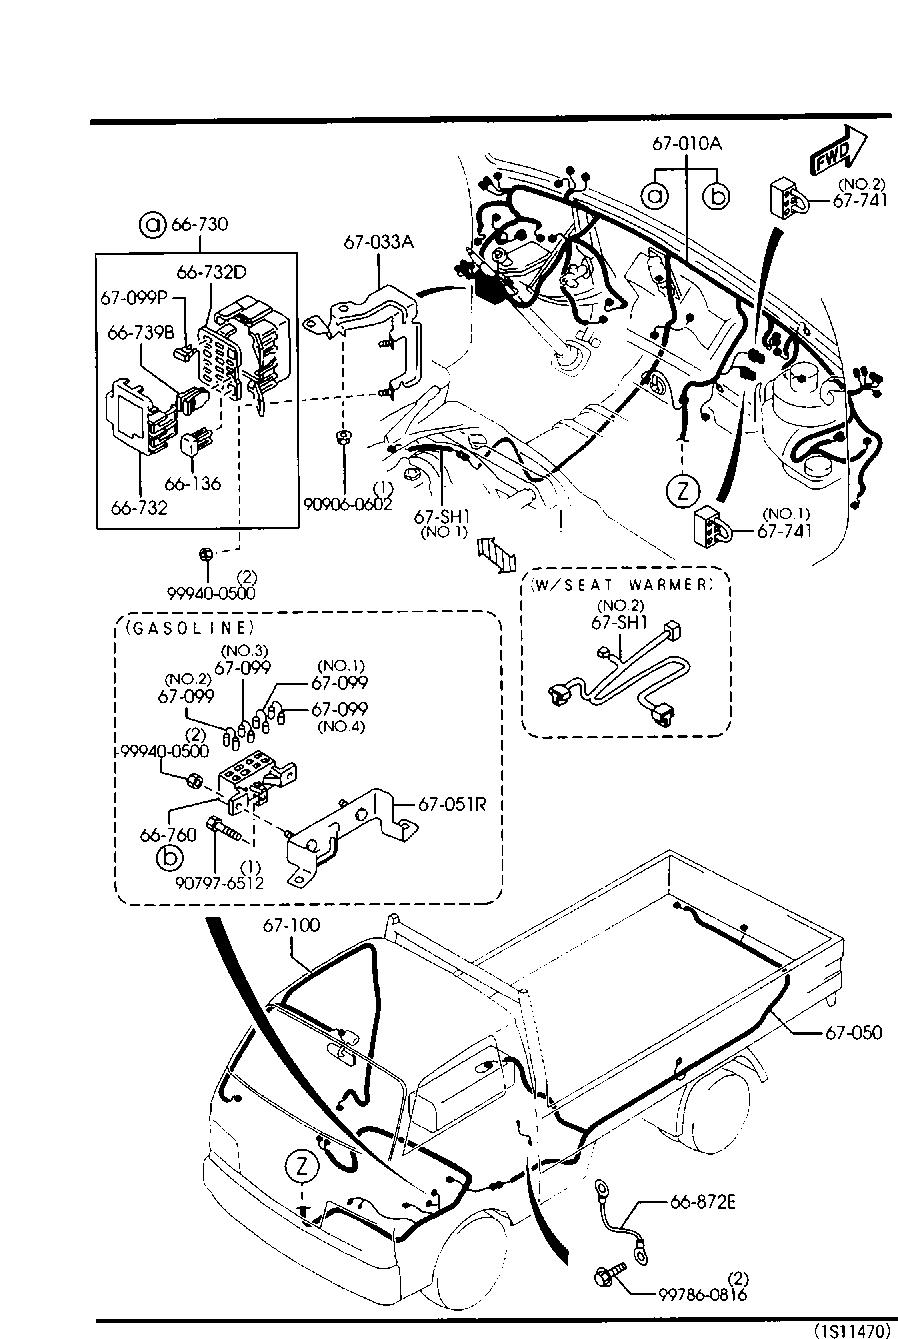 Mazda E2000 Main Fuse Box Electrical Wiring Diagrams Truck Auto Diagram U2022